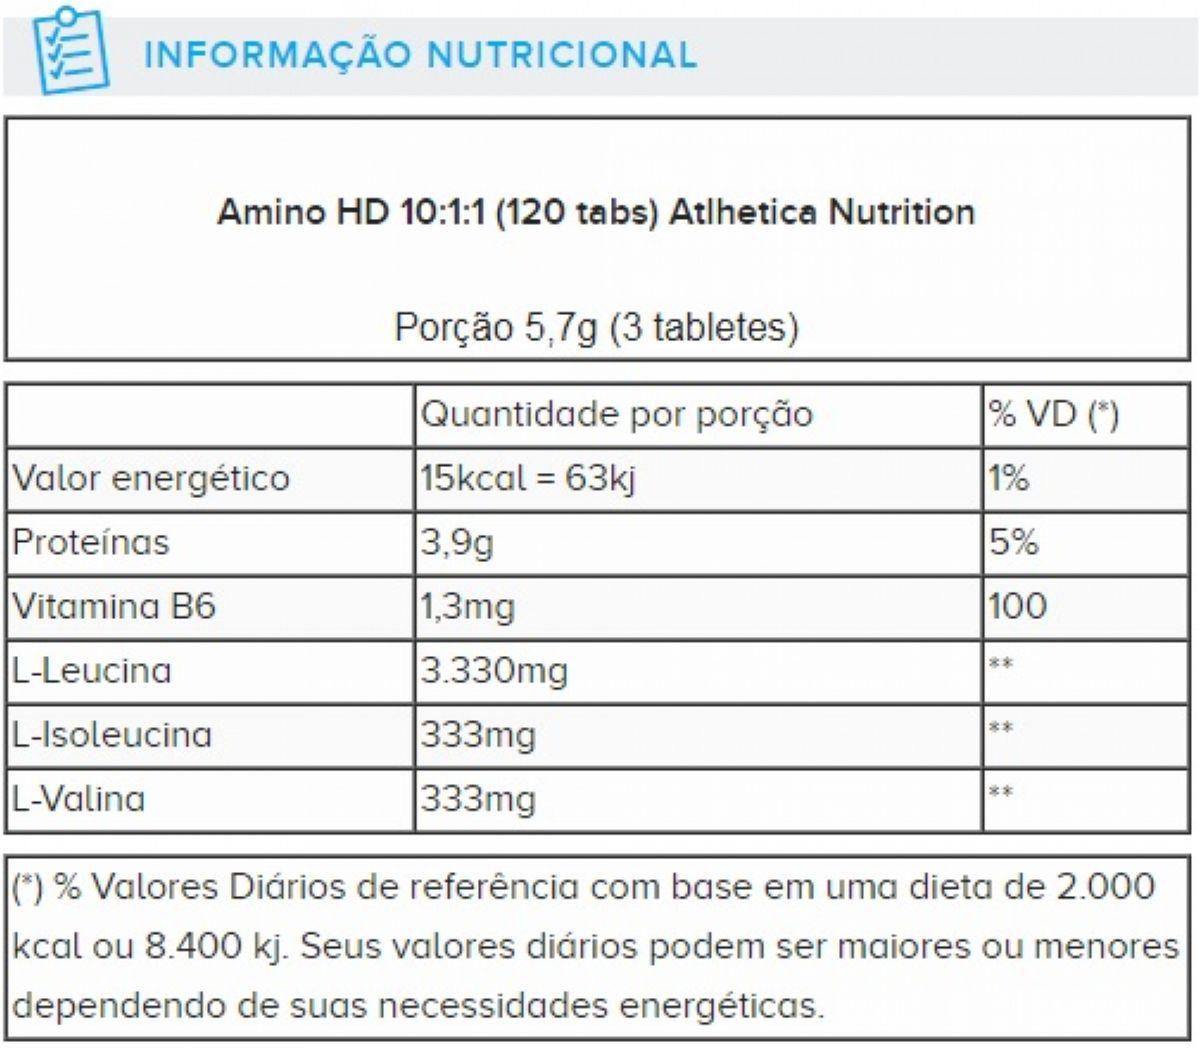 AMINO HD 10:1:1 120 ATBLETES ATLHETICA NUTRITION